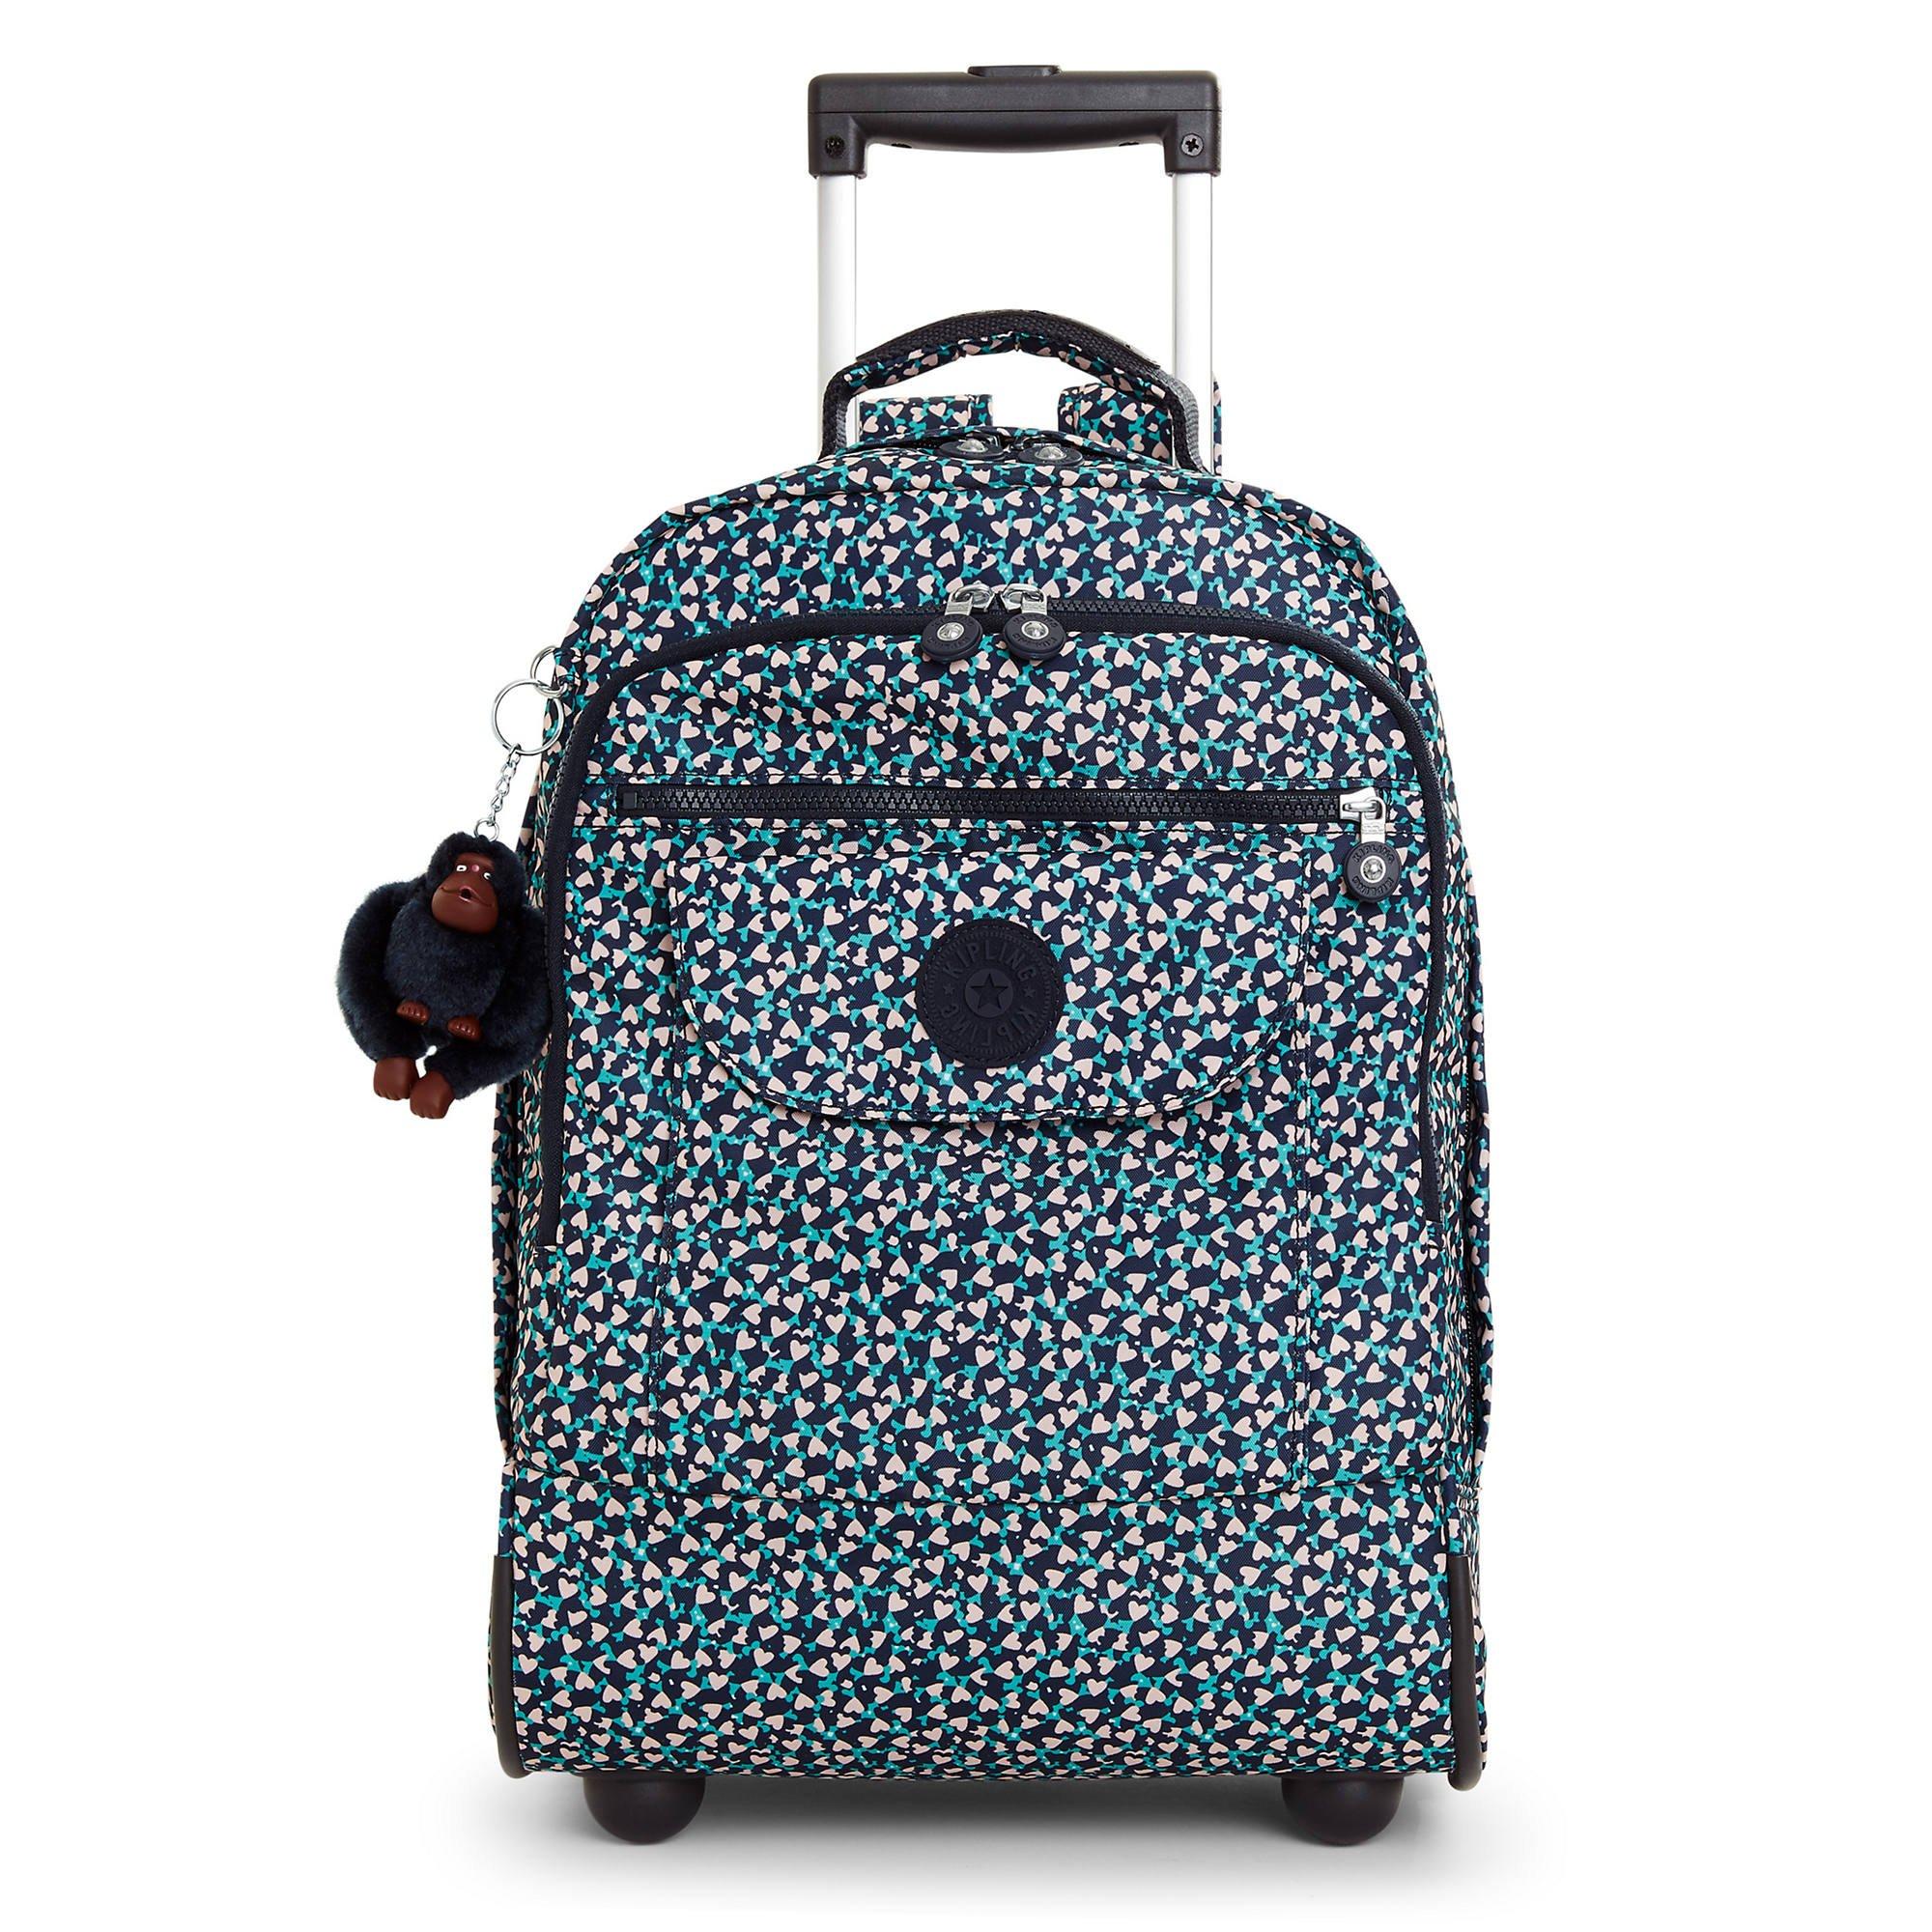 Kipling Women's Sanaa Large Printed Rolling Backpack One Size Think Spring